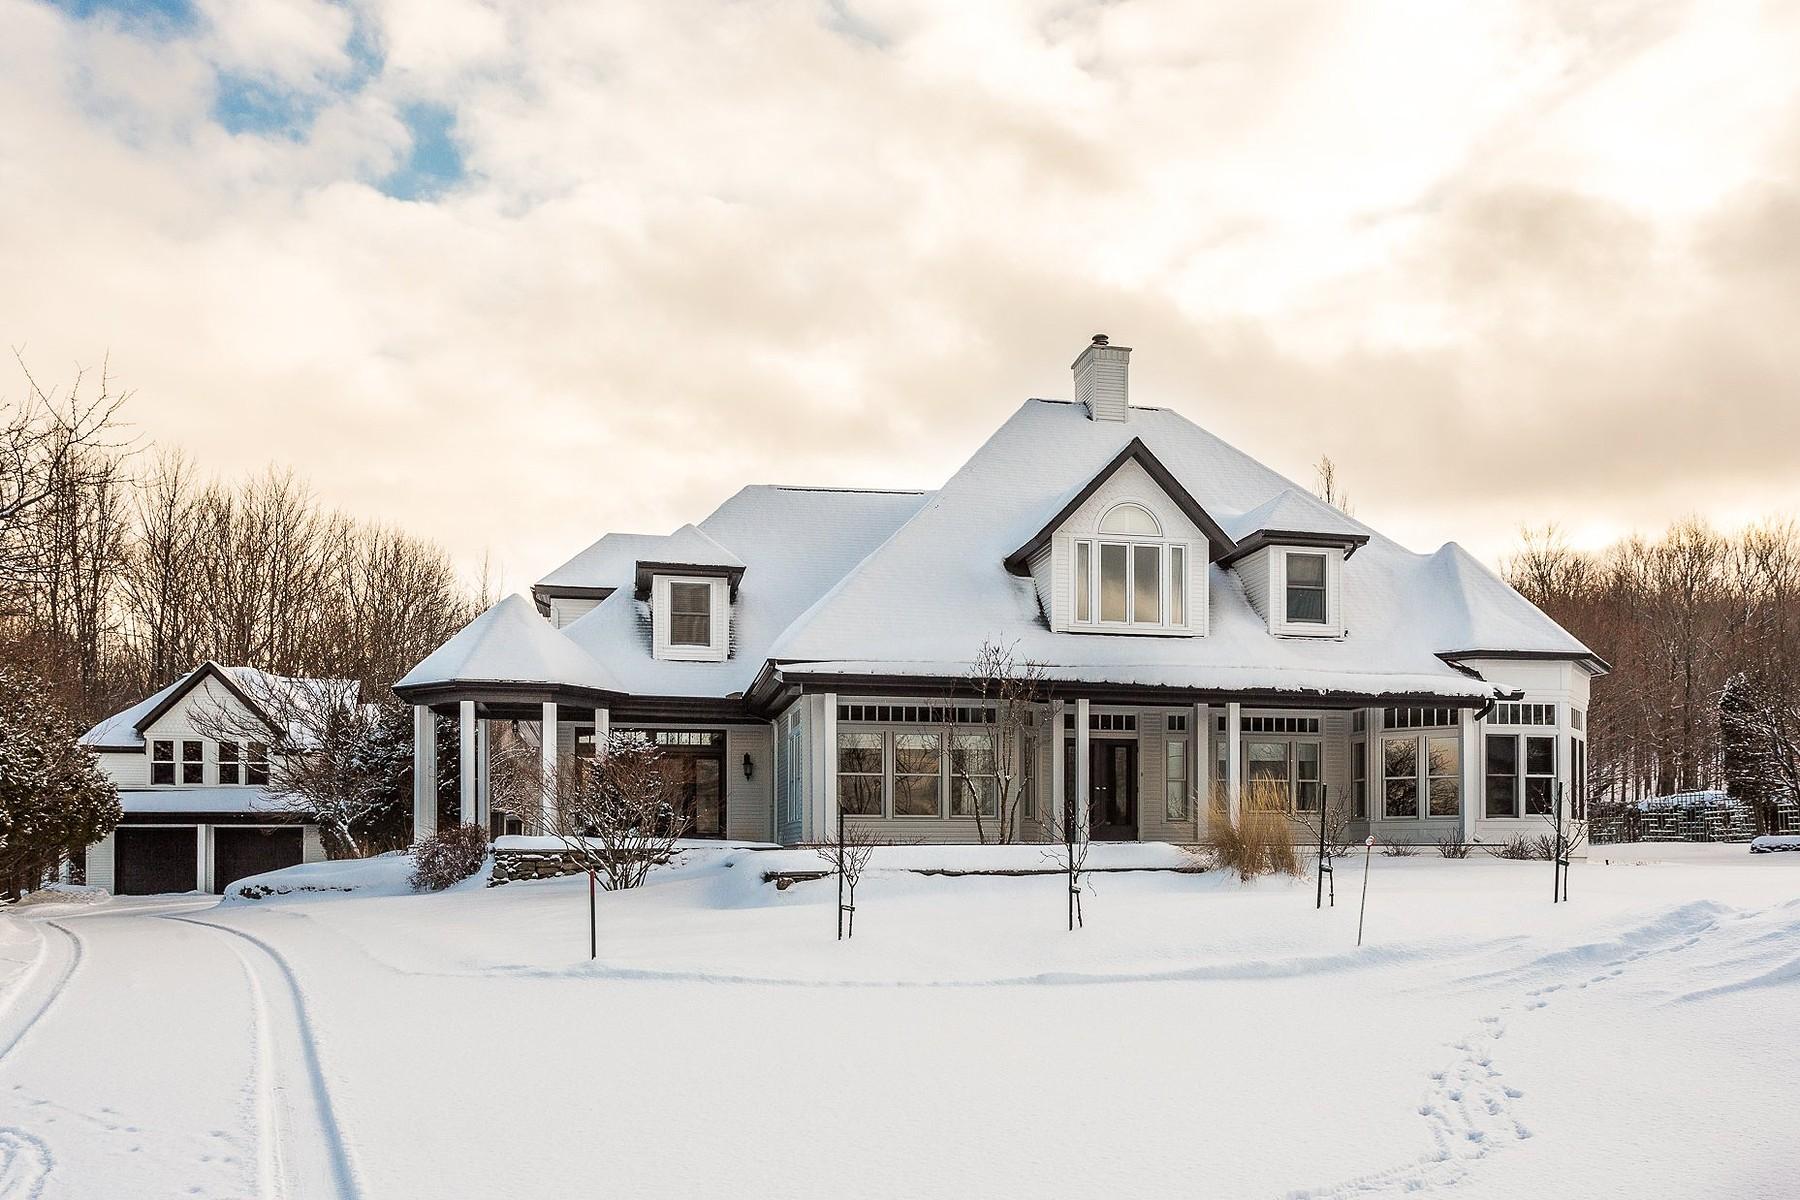 Single Family Homes for Sale at Magog, Estrie 133 Crois. Stanislas Magog, Quebec J1X0M7 Canada